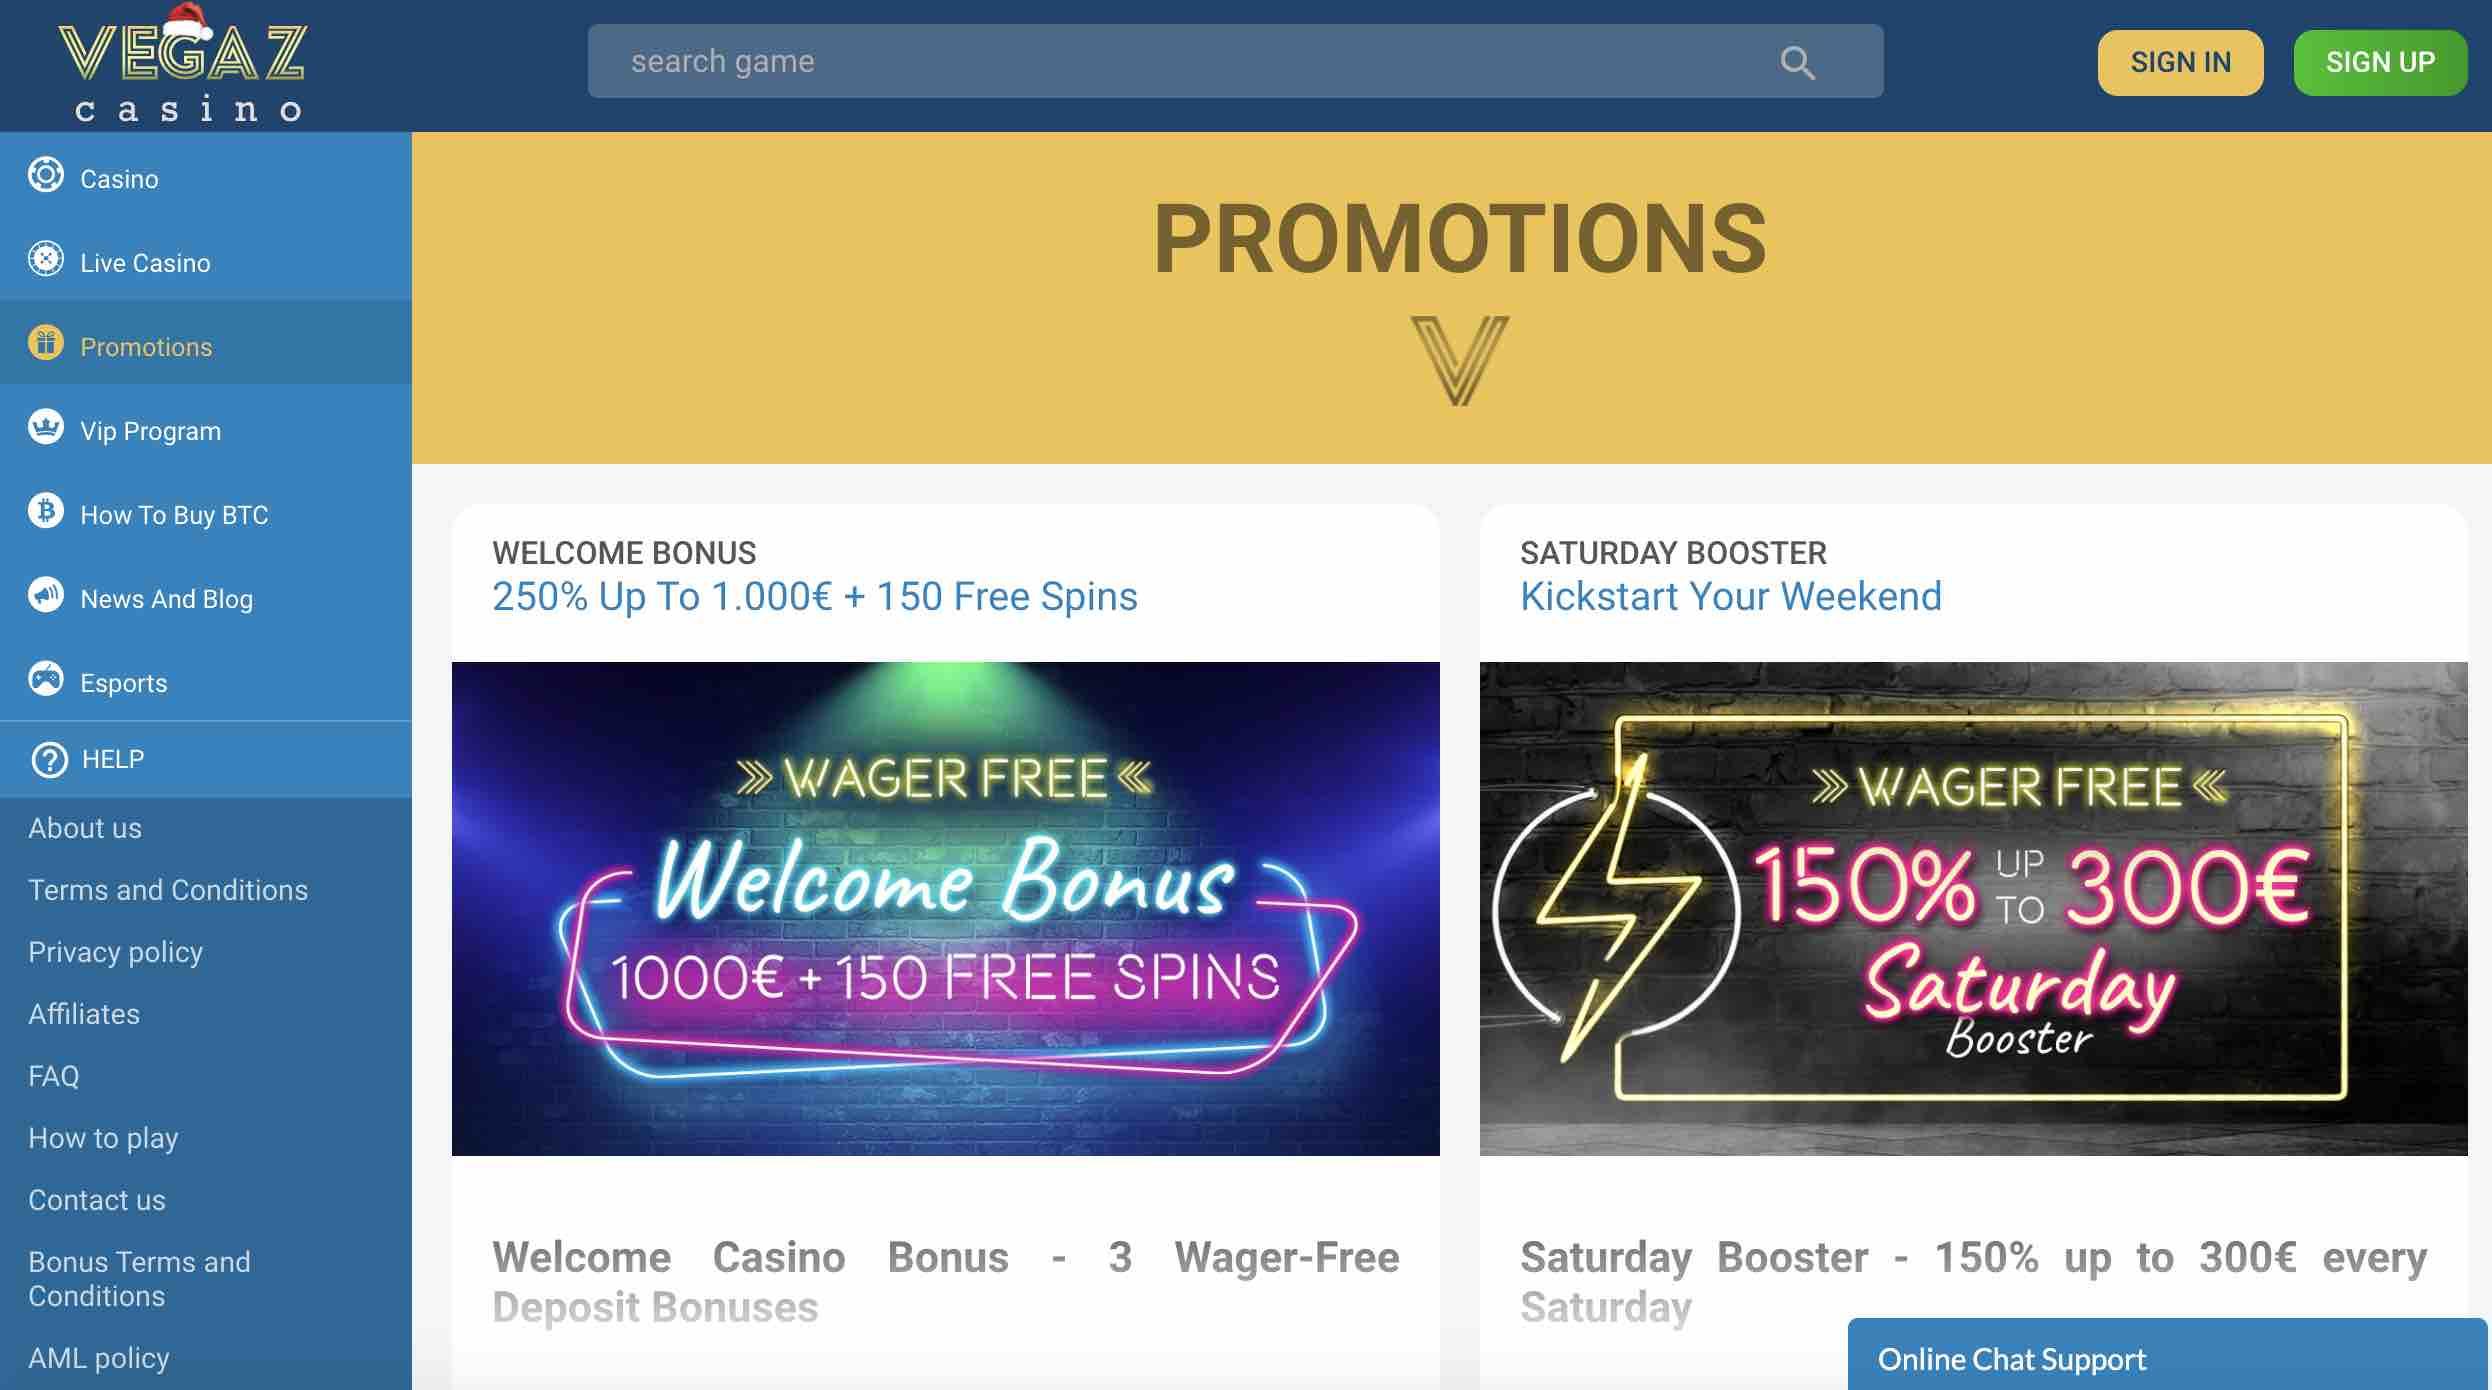 Welcome Bonus at Vegaz Casino